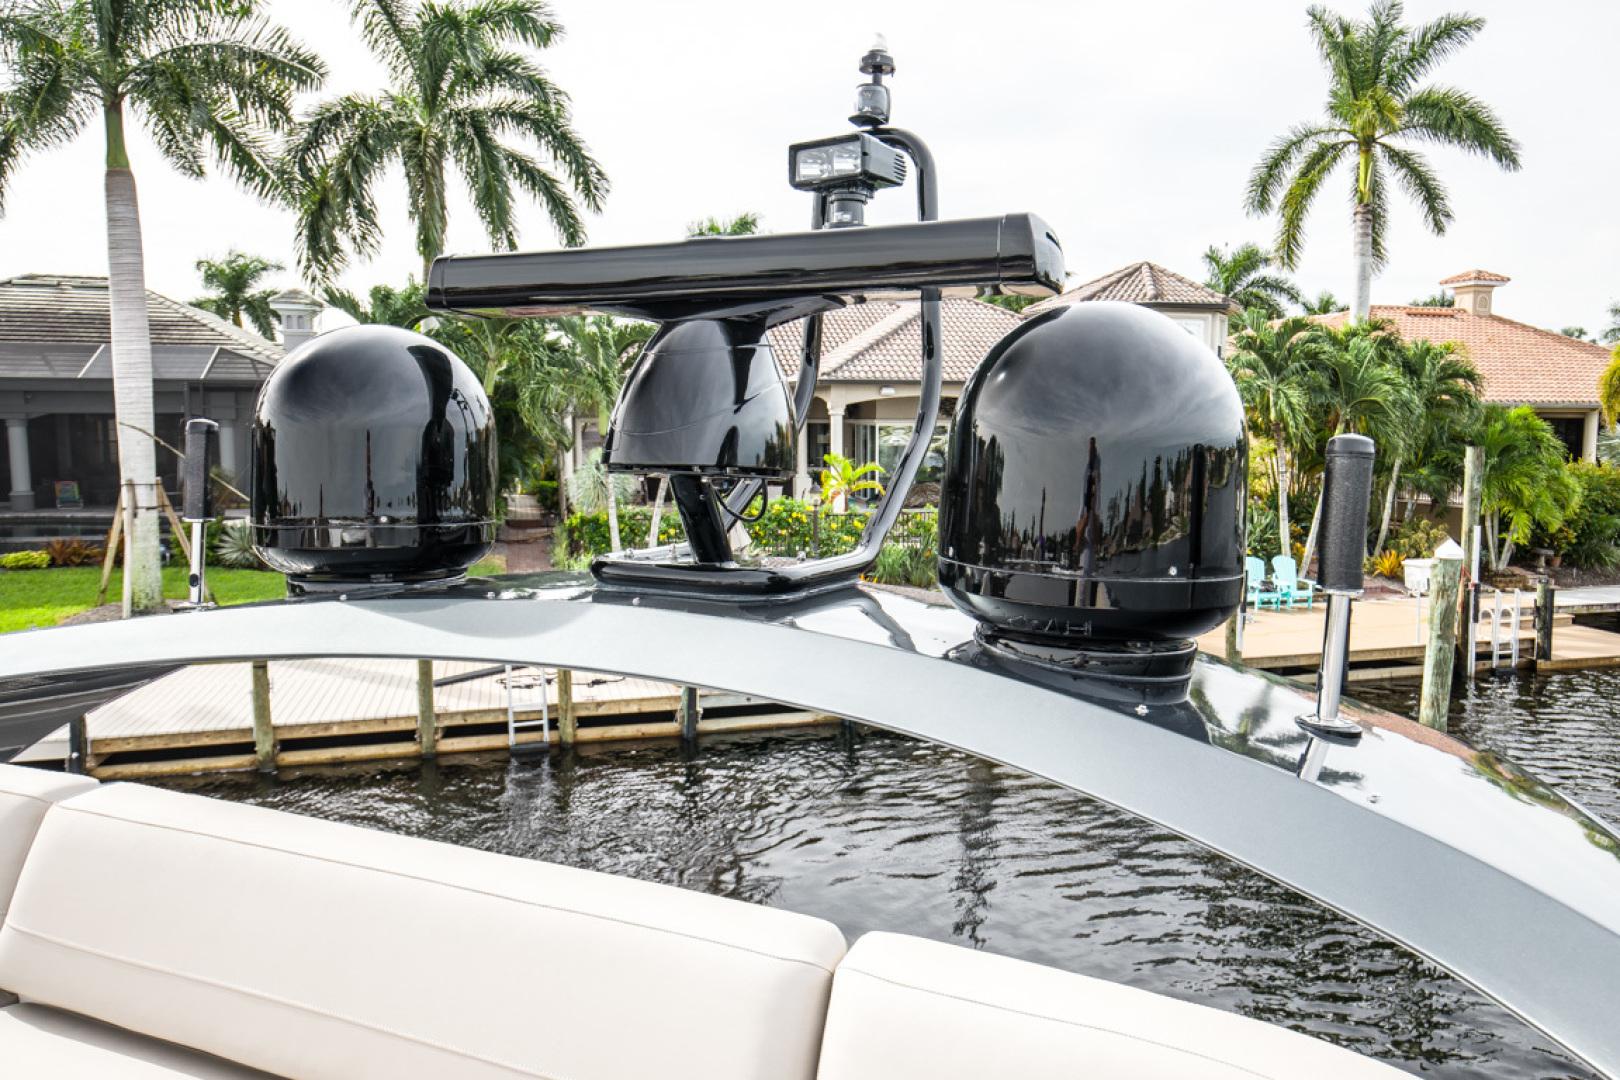 Princess-S65 2019-Paragon Cape Coral-Florida-United States-2019 65 Princess S65-Paragon-Radar Arch-1510316 | Thumbnail